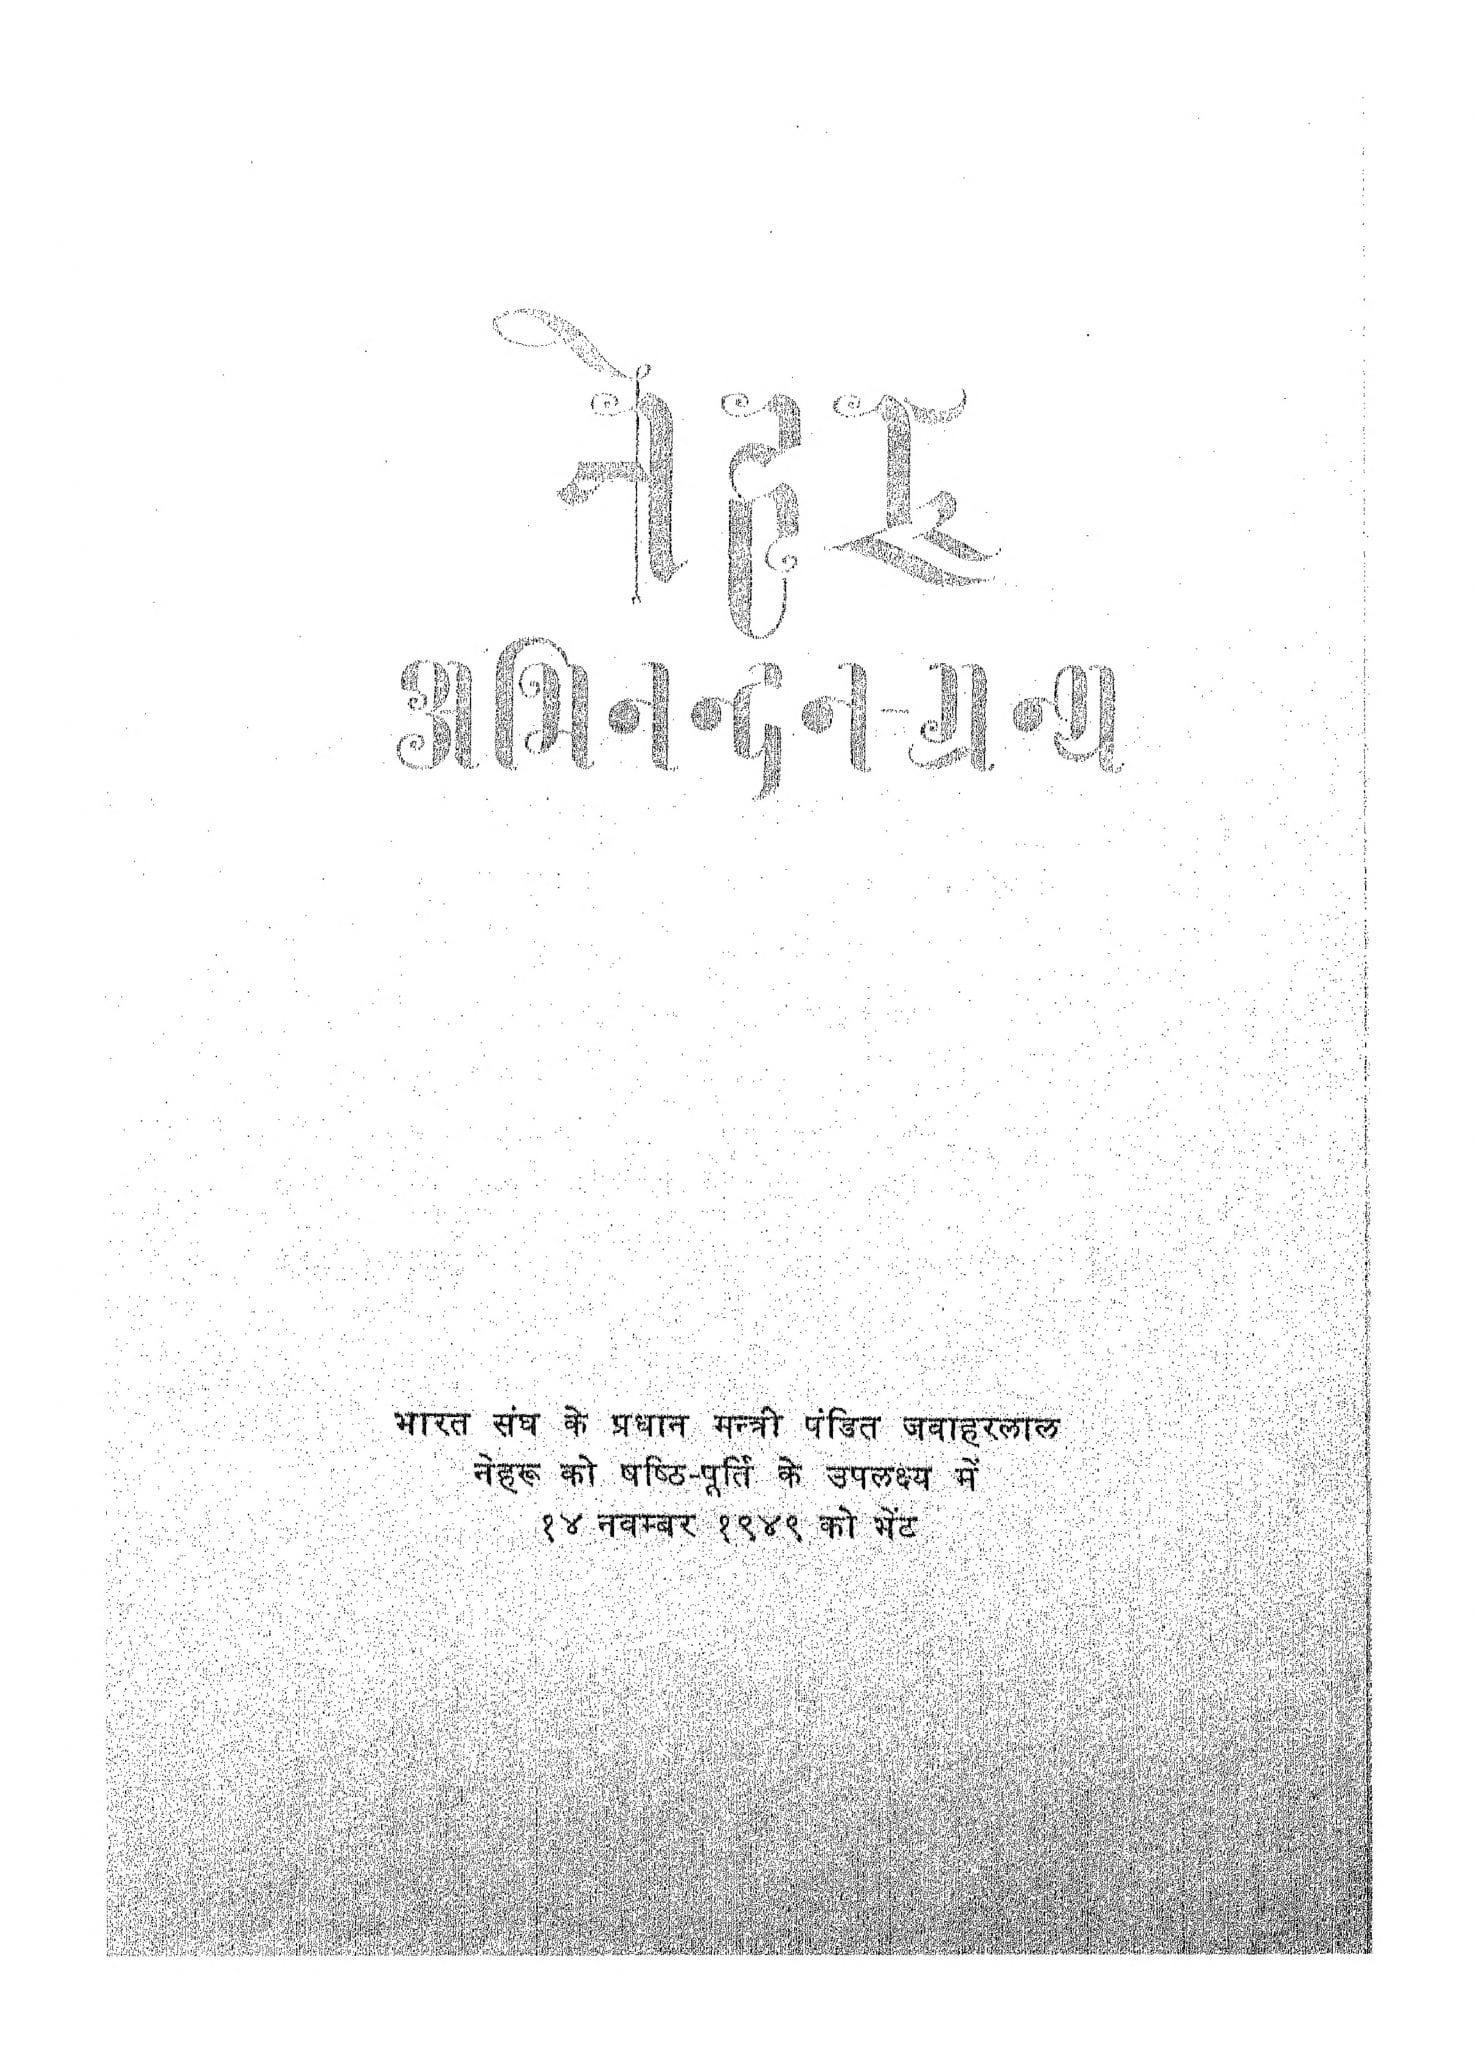 Nehru Abhinandan Granth by पंडित जवाहरलाल नेहरू -Pt. Javaharlal Neharu